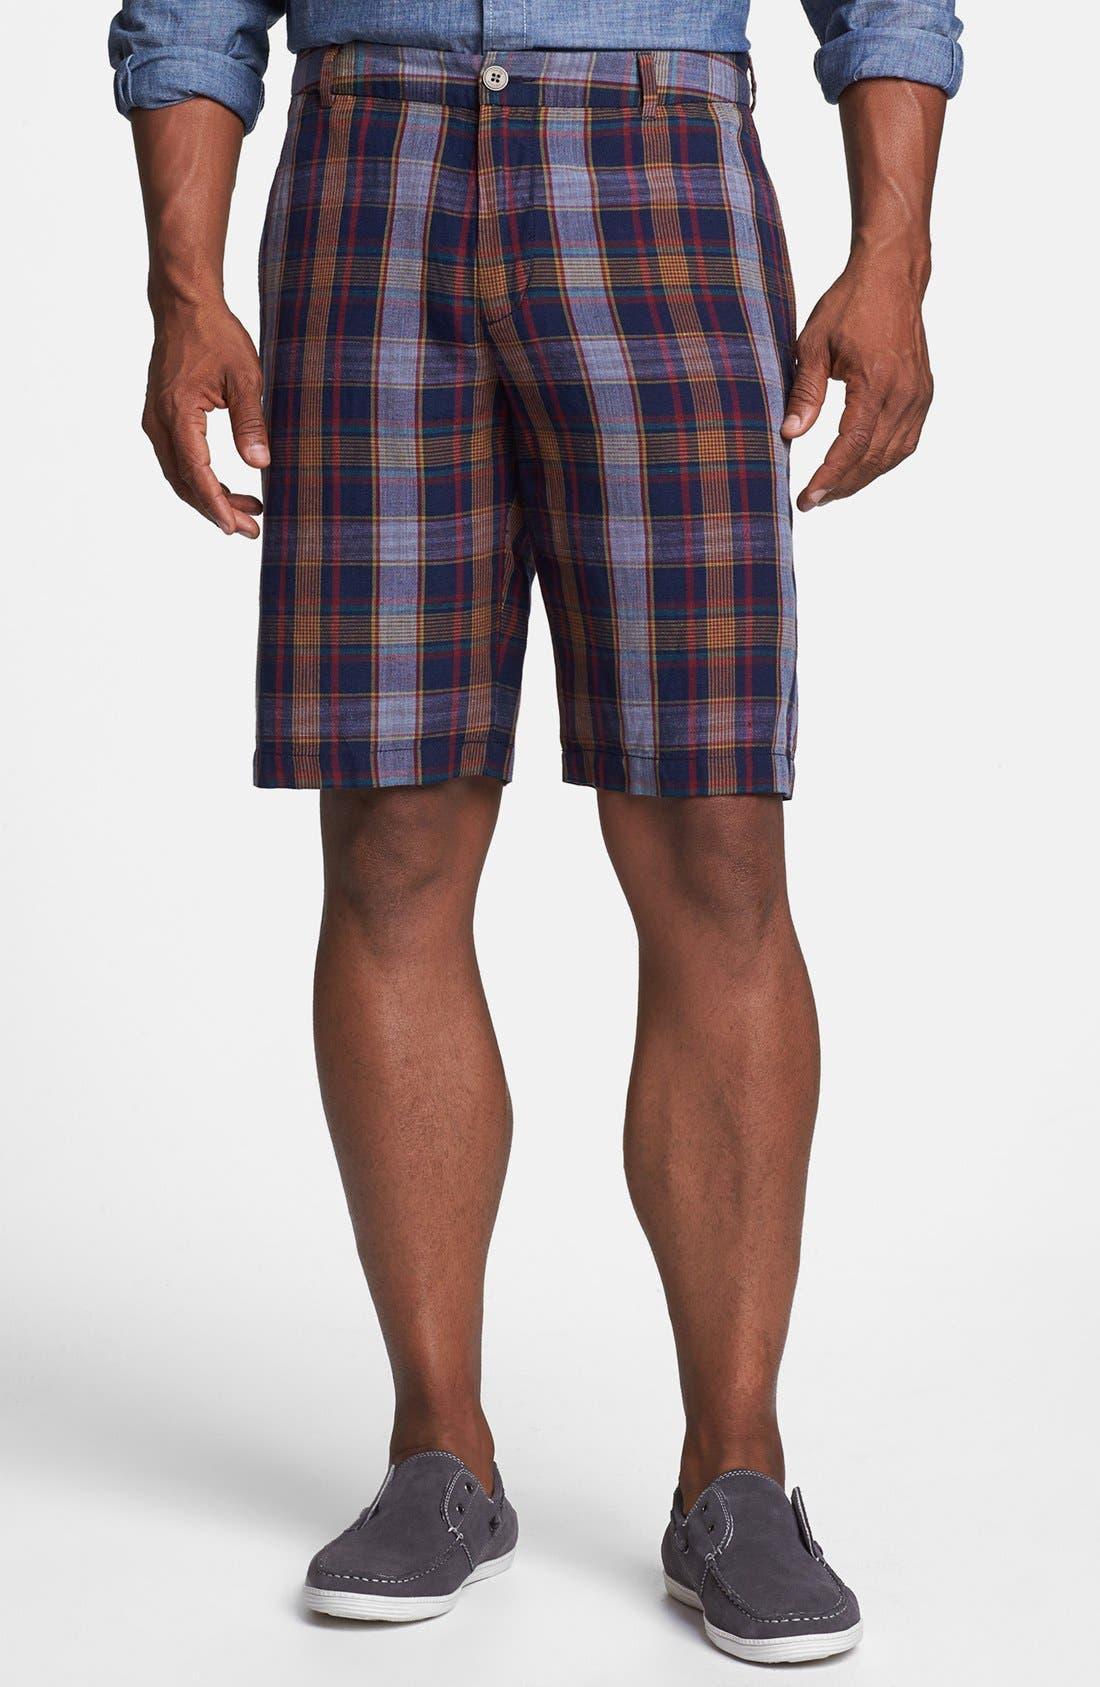 Alternate Image 1 Selected - Tommy Bahama 'Las Palmas' Plaid Shorts